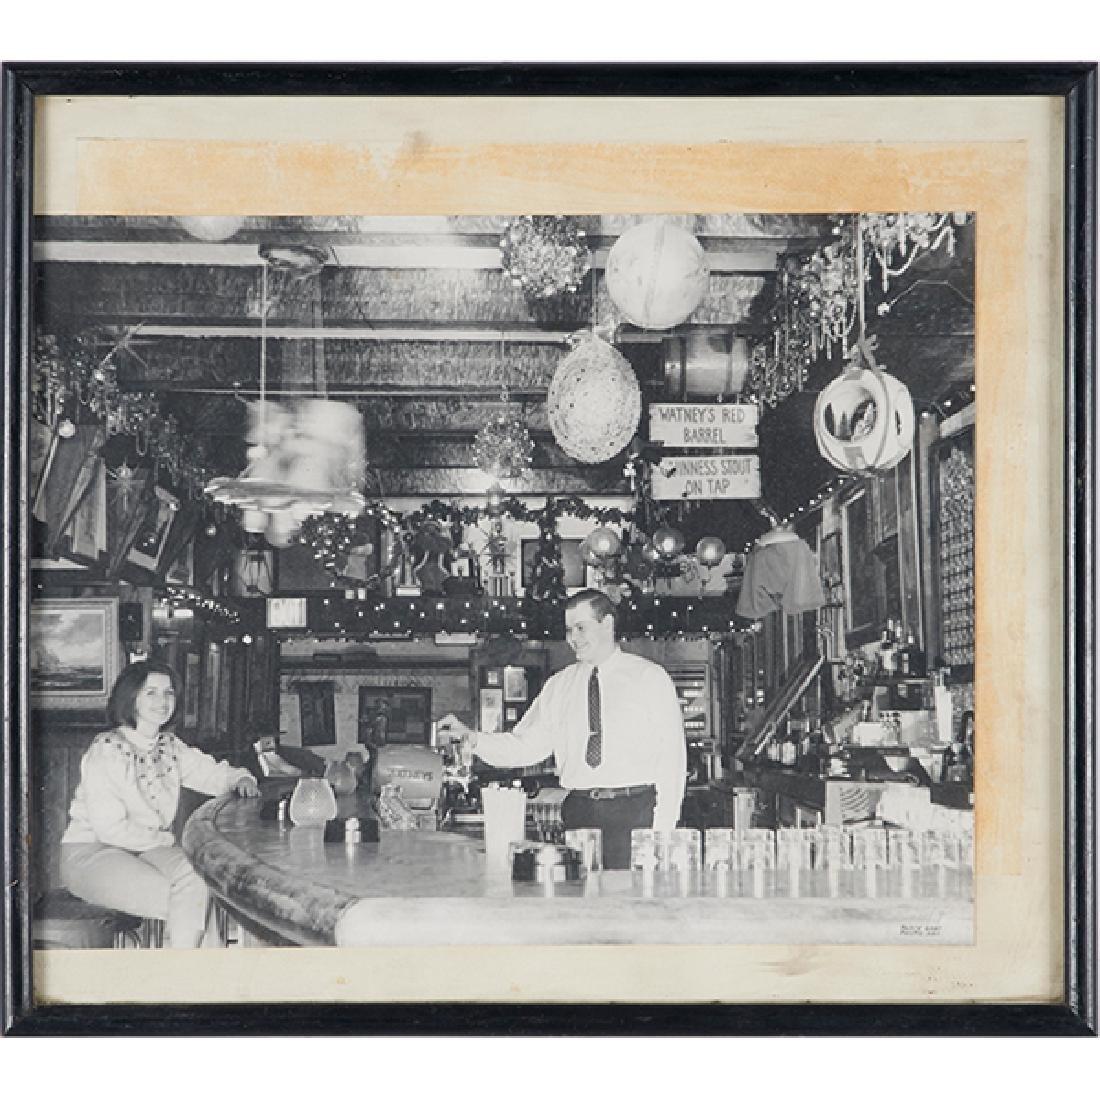 Vintage Photography, Butch McGuire's framed interior